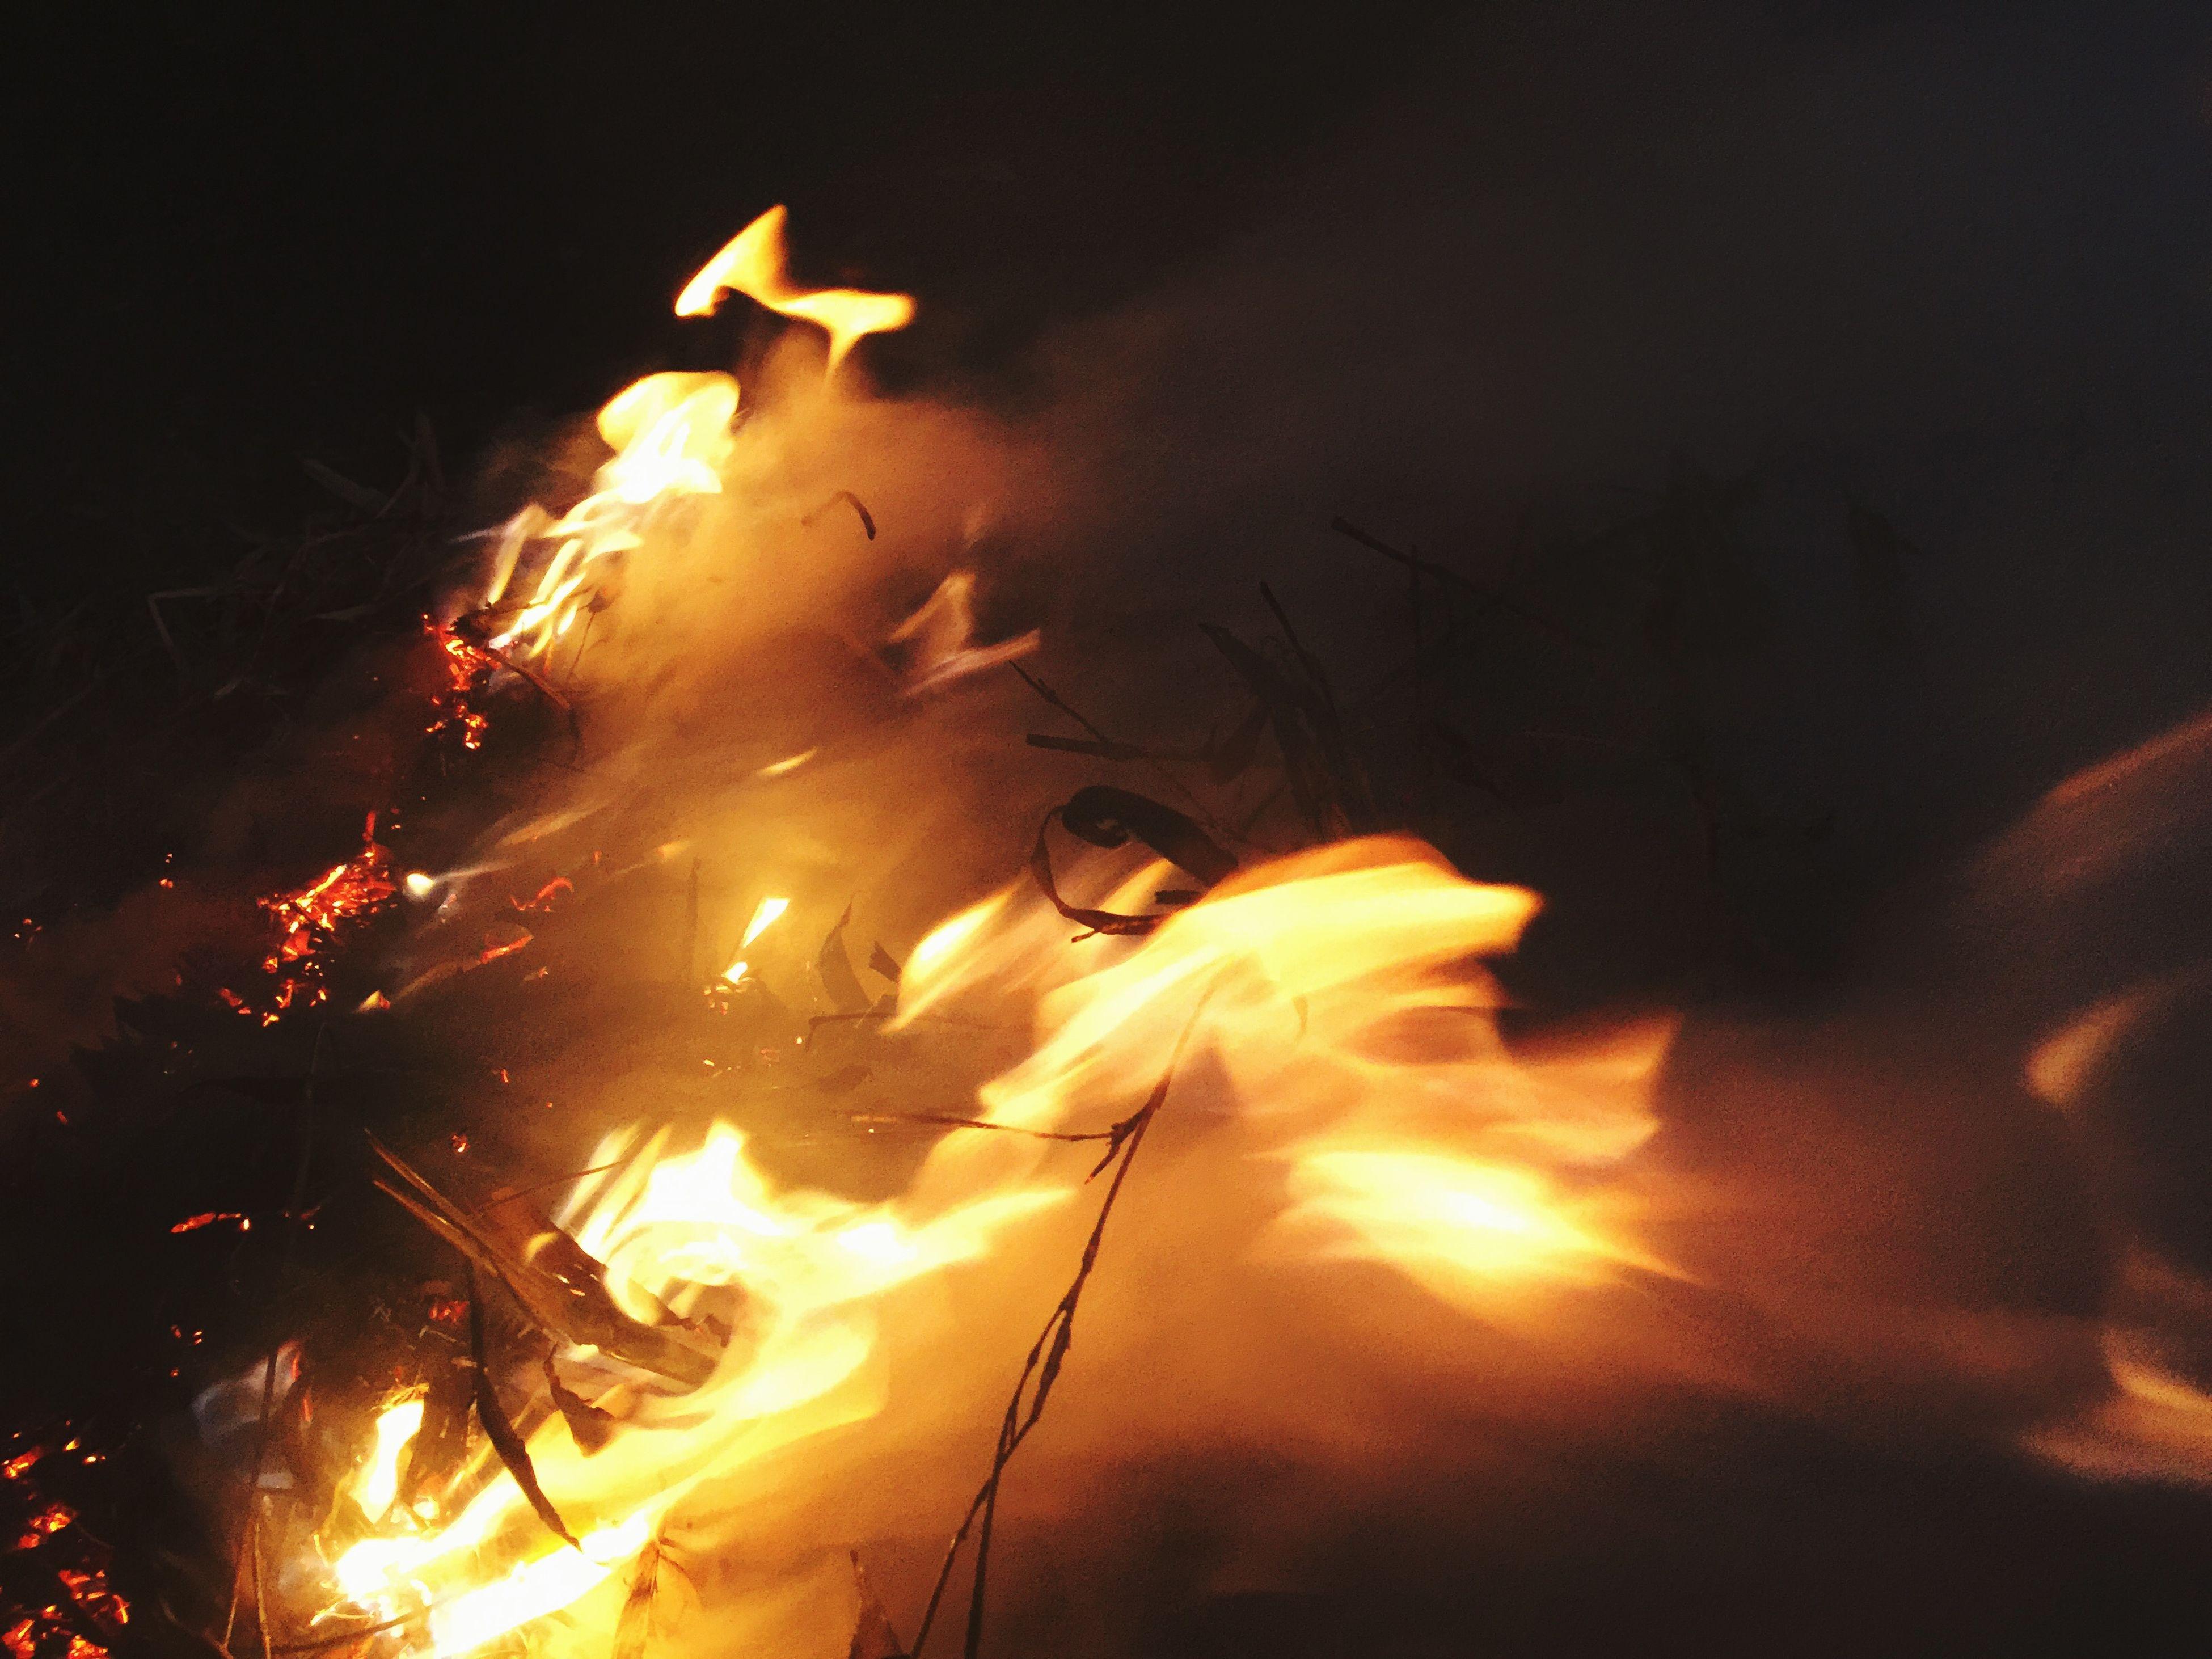 flame, burning, fire - natural phenomenon, night, illuminated, glowing, heat - temperature, fire, orange color, light - natural phenomenon, bonfire, dark, motion, long exposure, lit, no people, outdoors, heat, lighting equipment, firewood